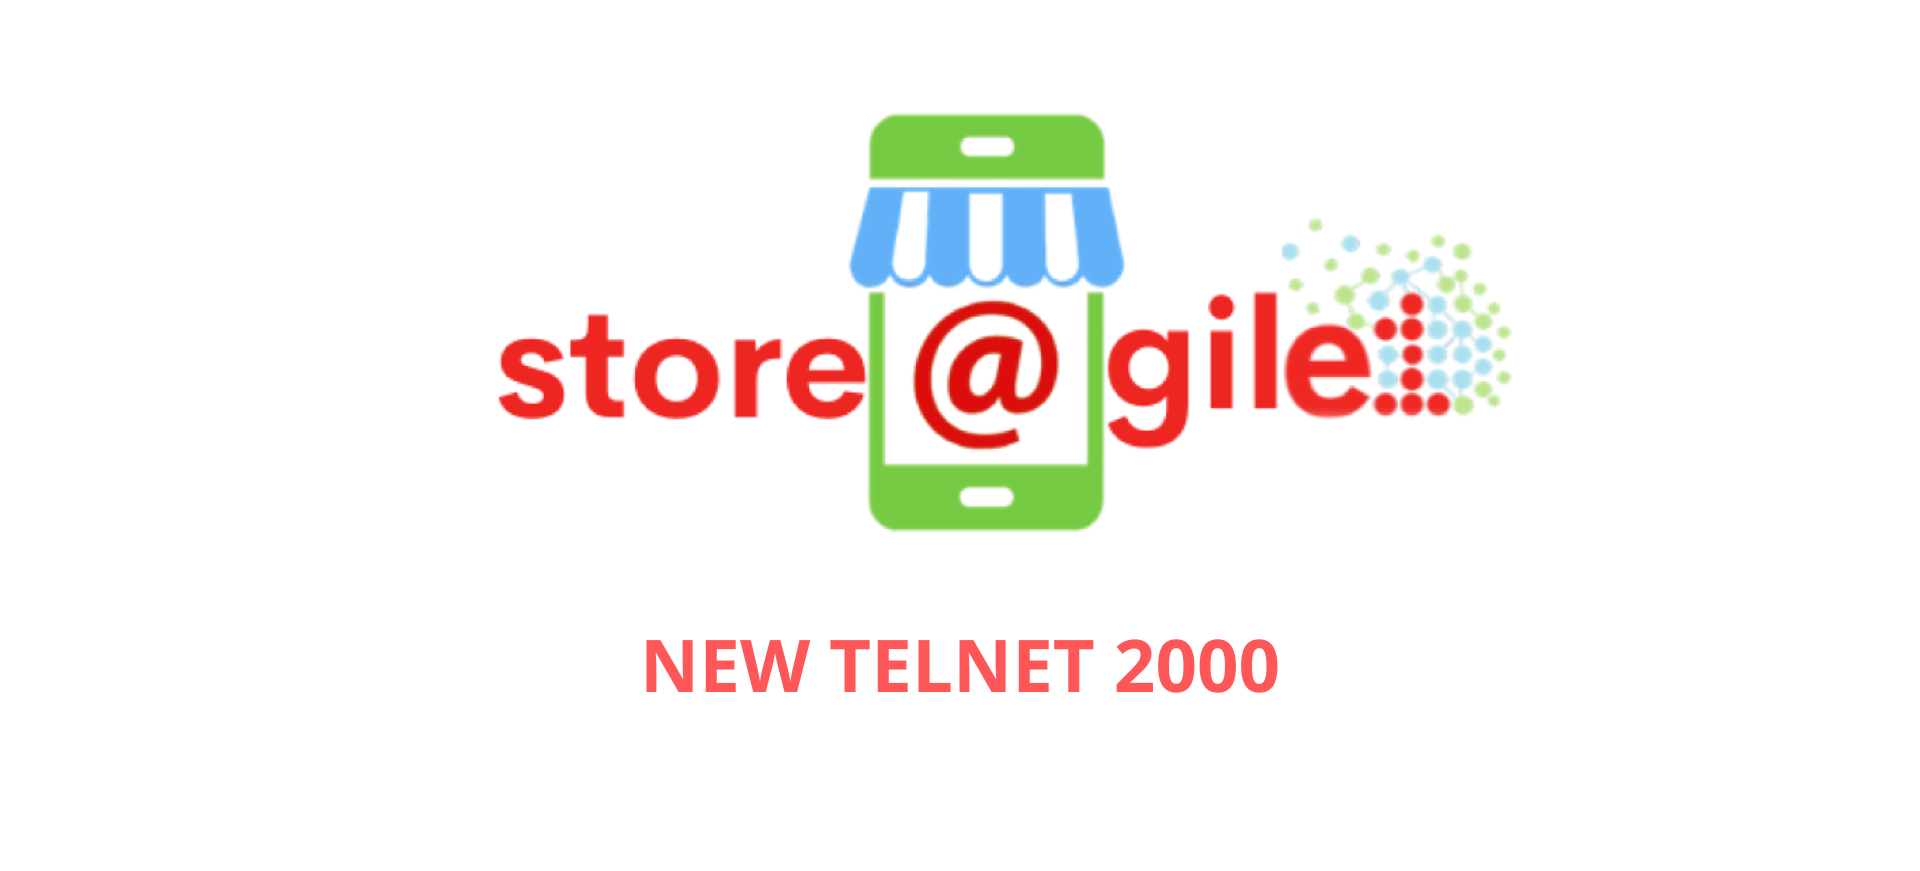 New Telnet 2000